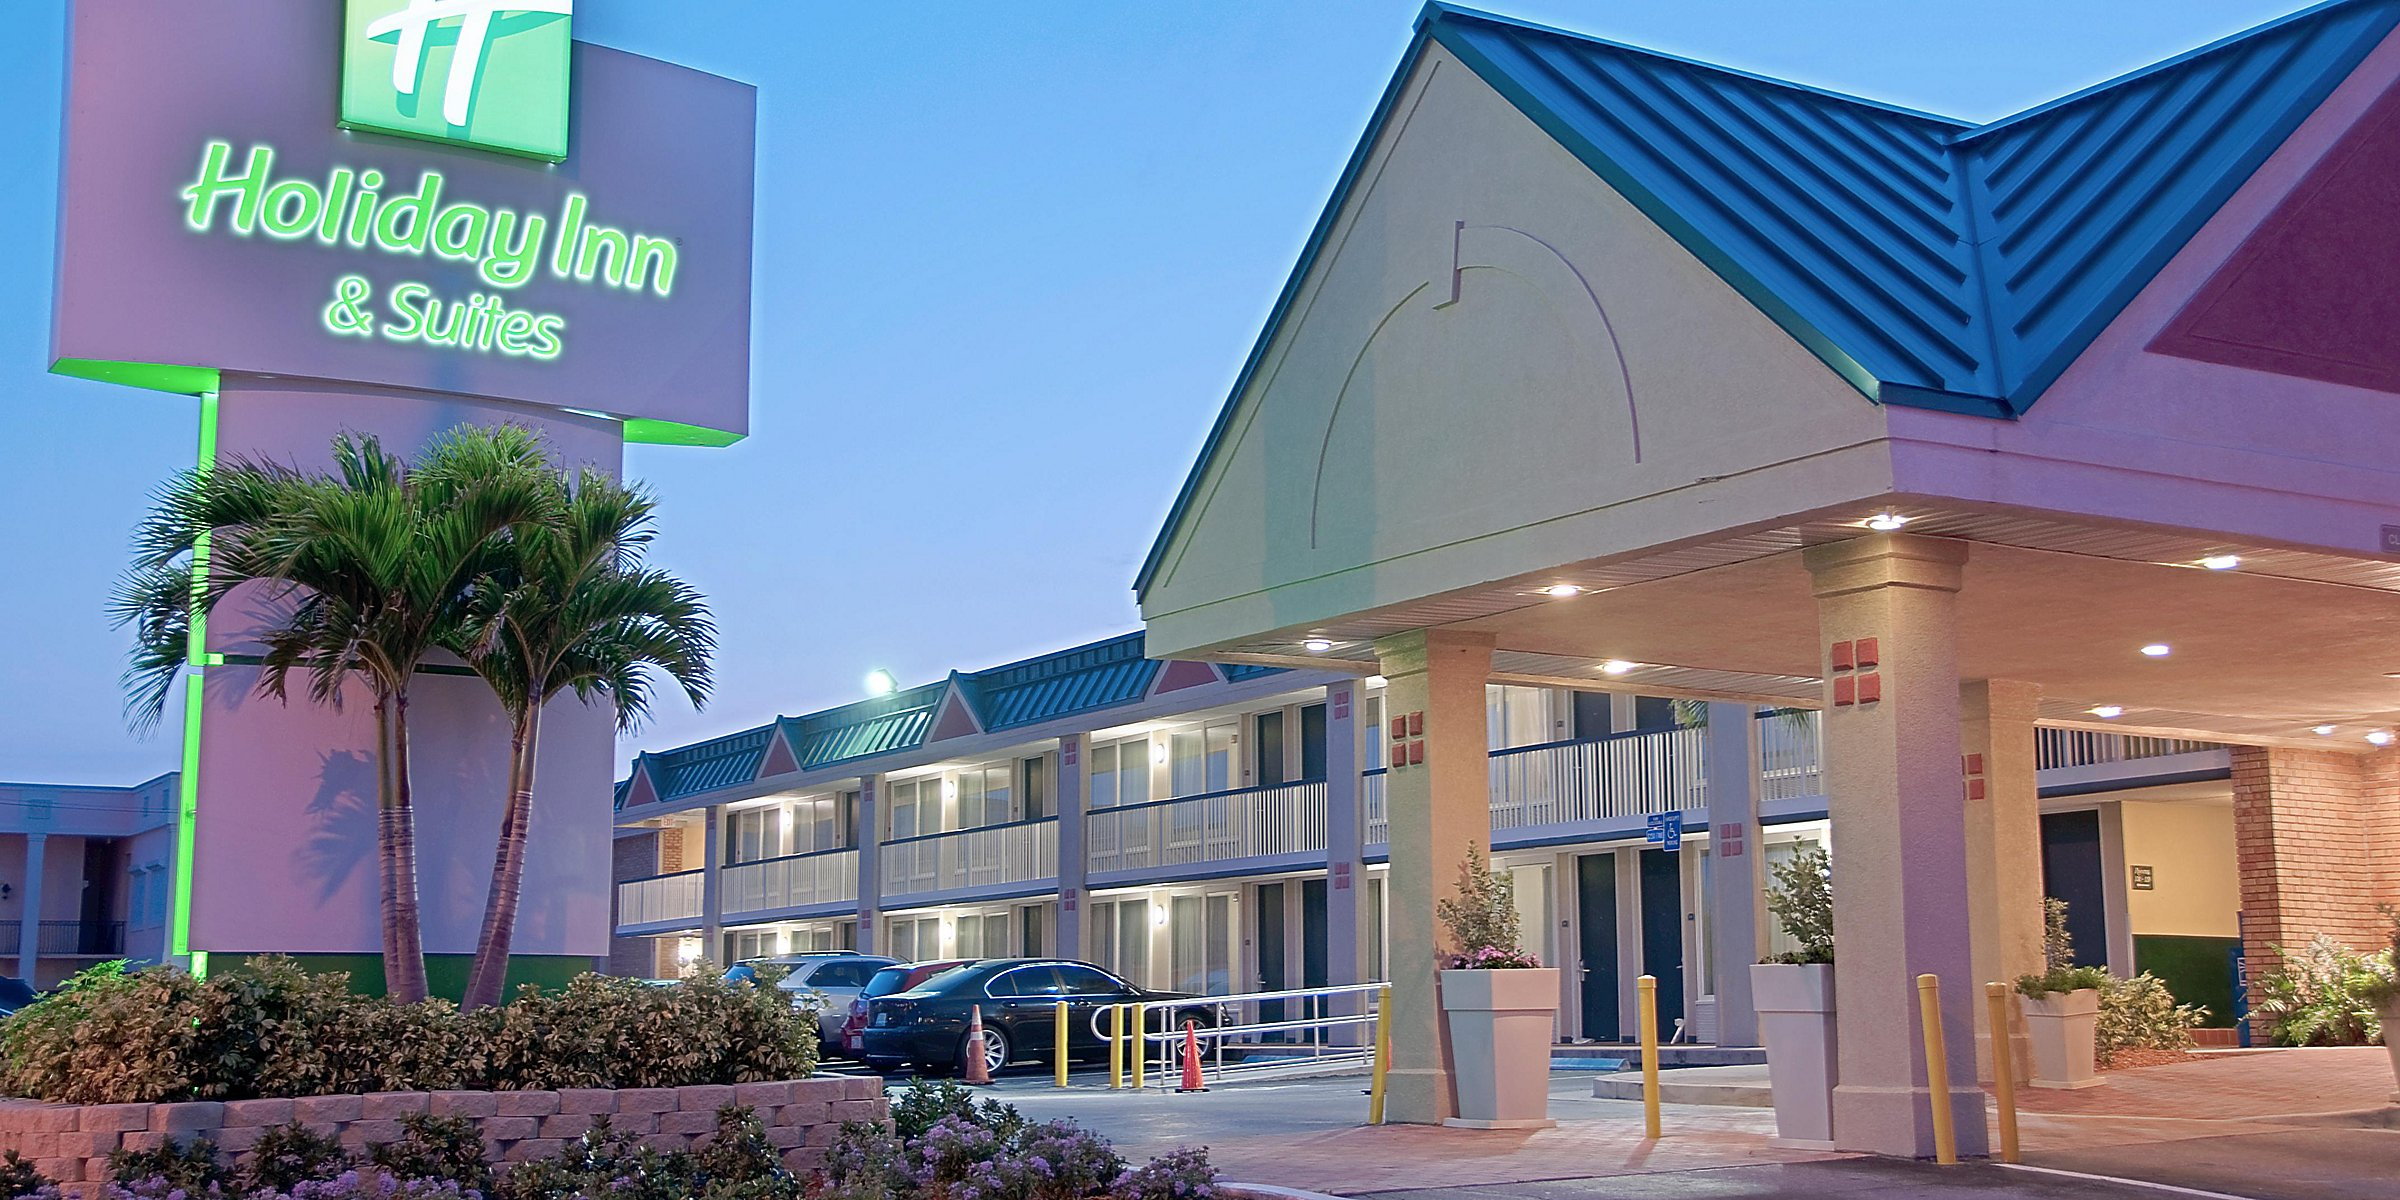 Holiday Inn Suites Vero Beach